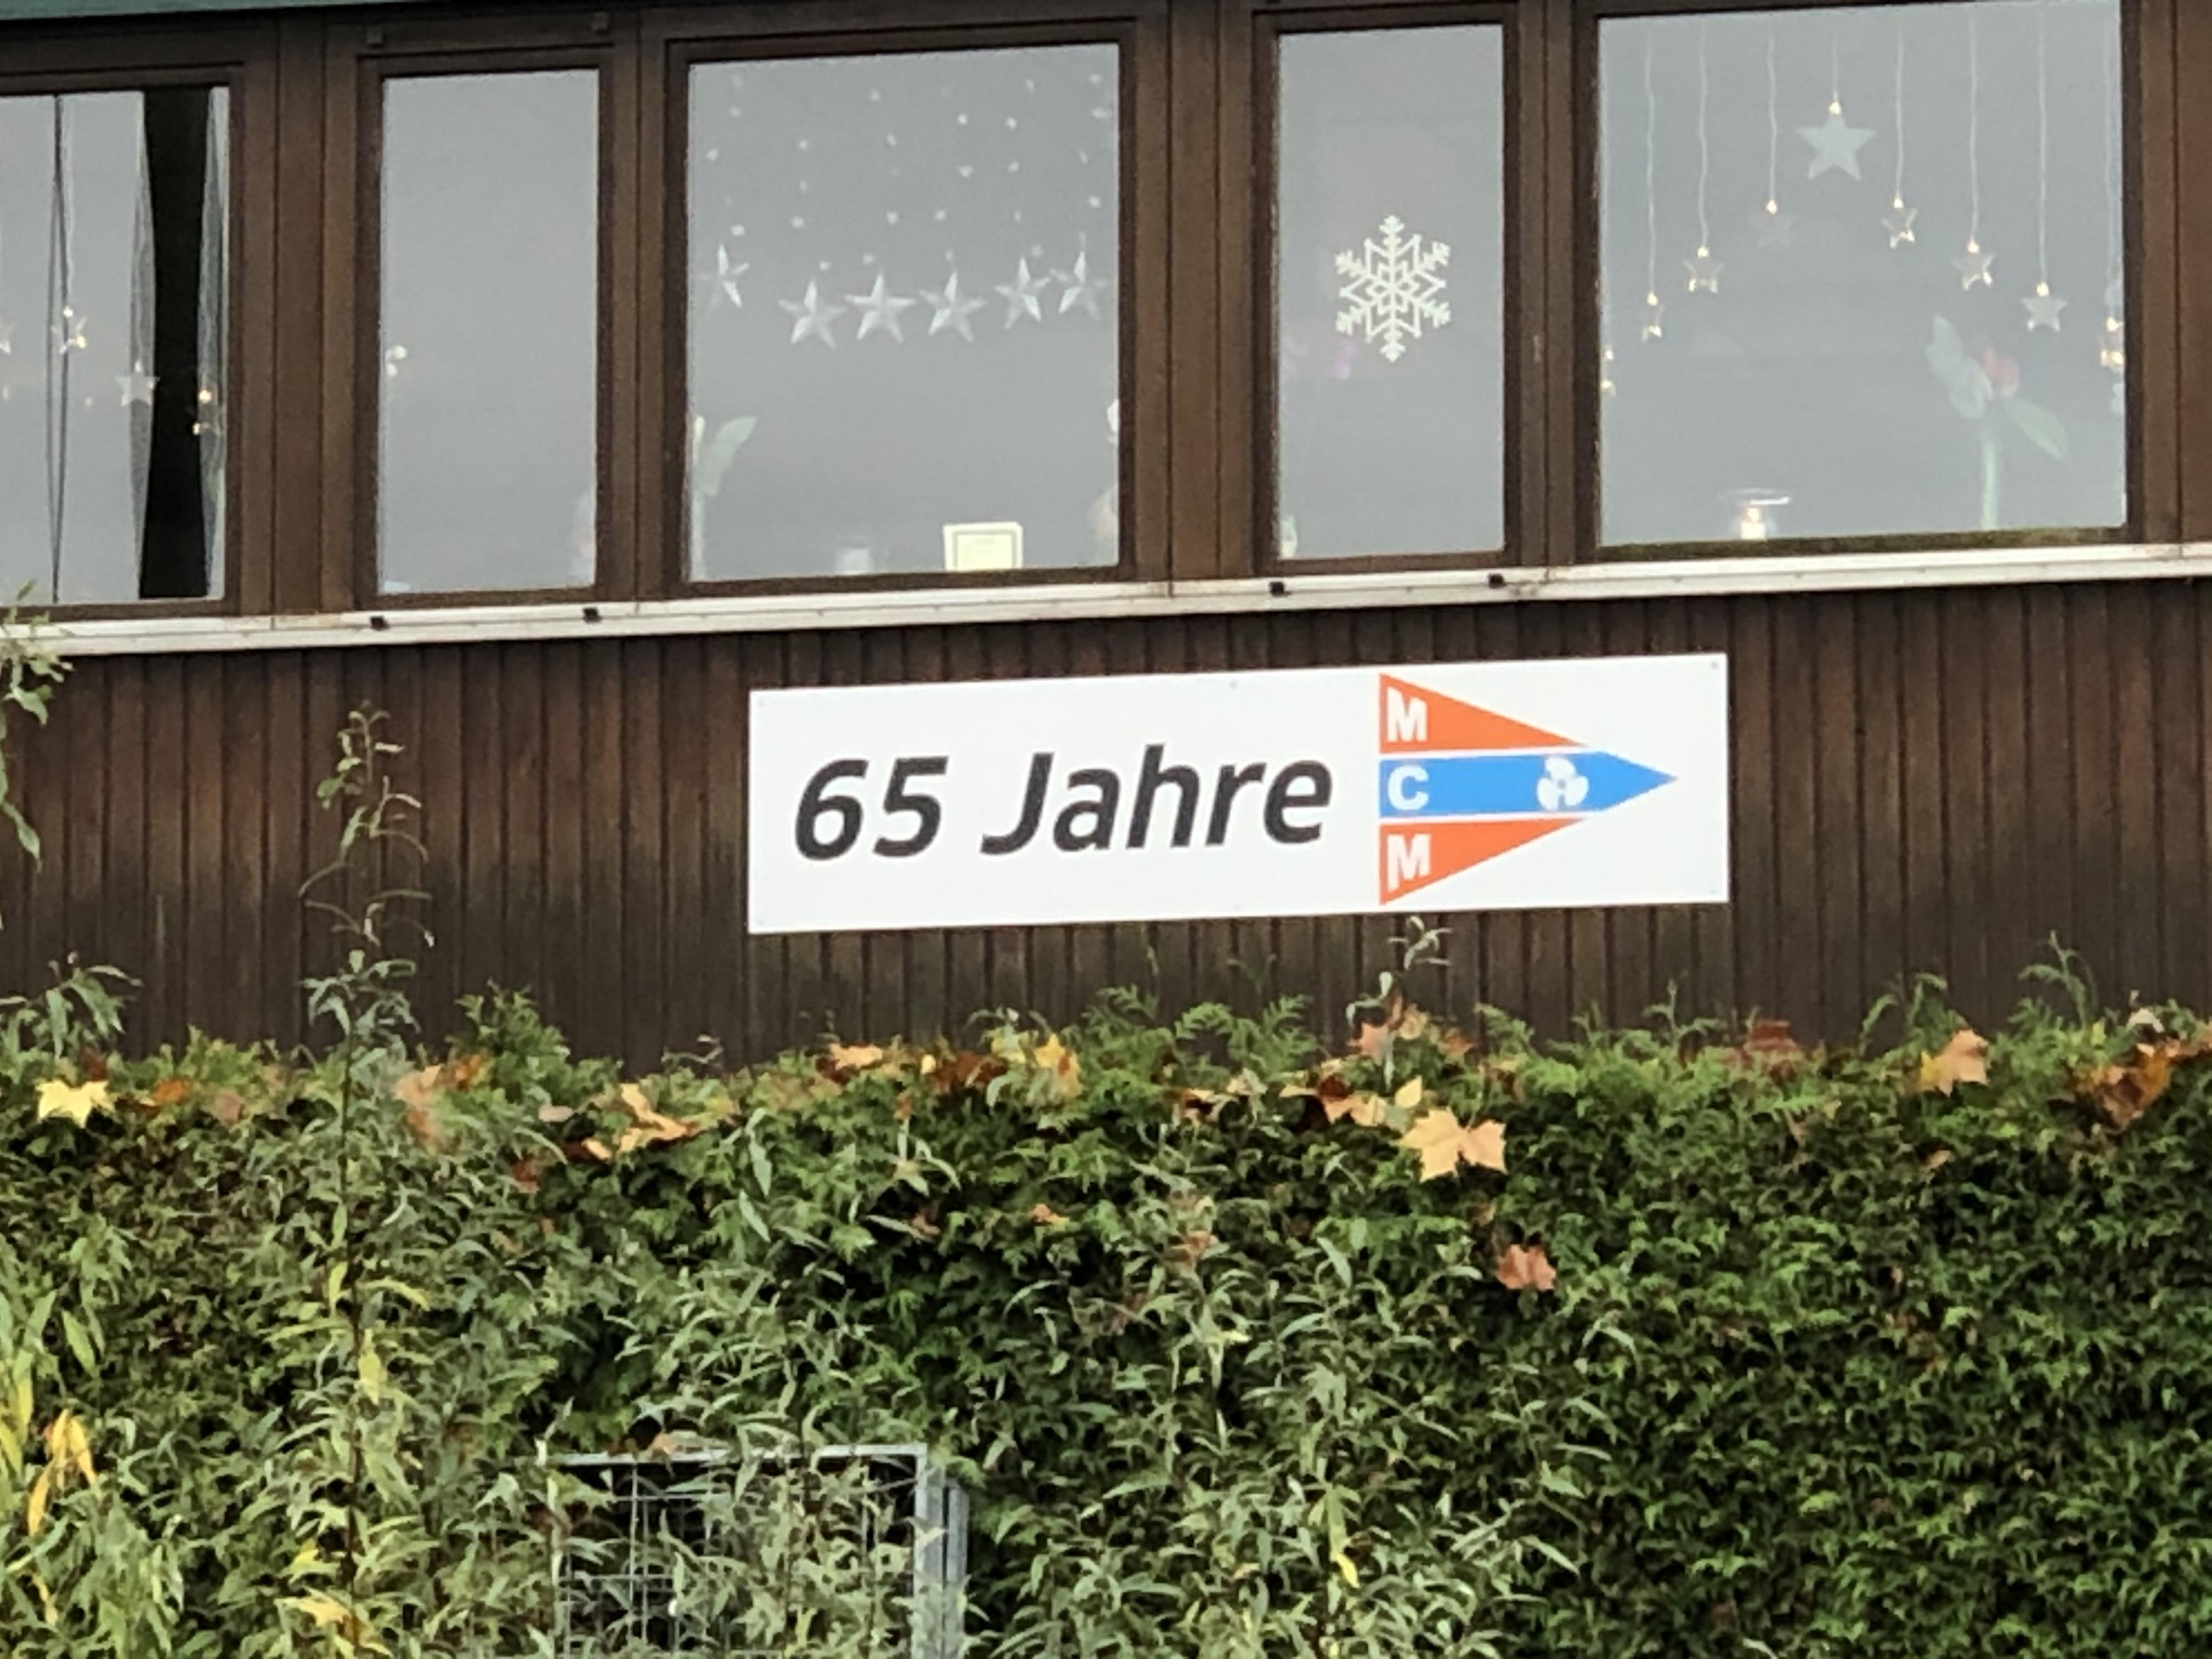 mcm wiesbaden - motorbootclub mitterhein ev wiesbaden